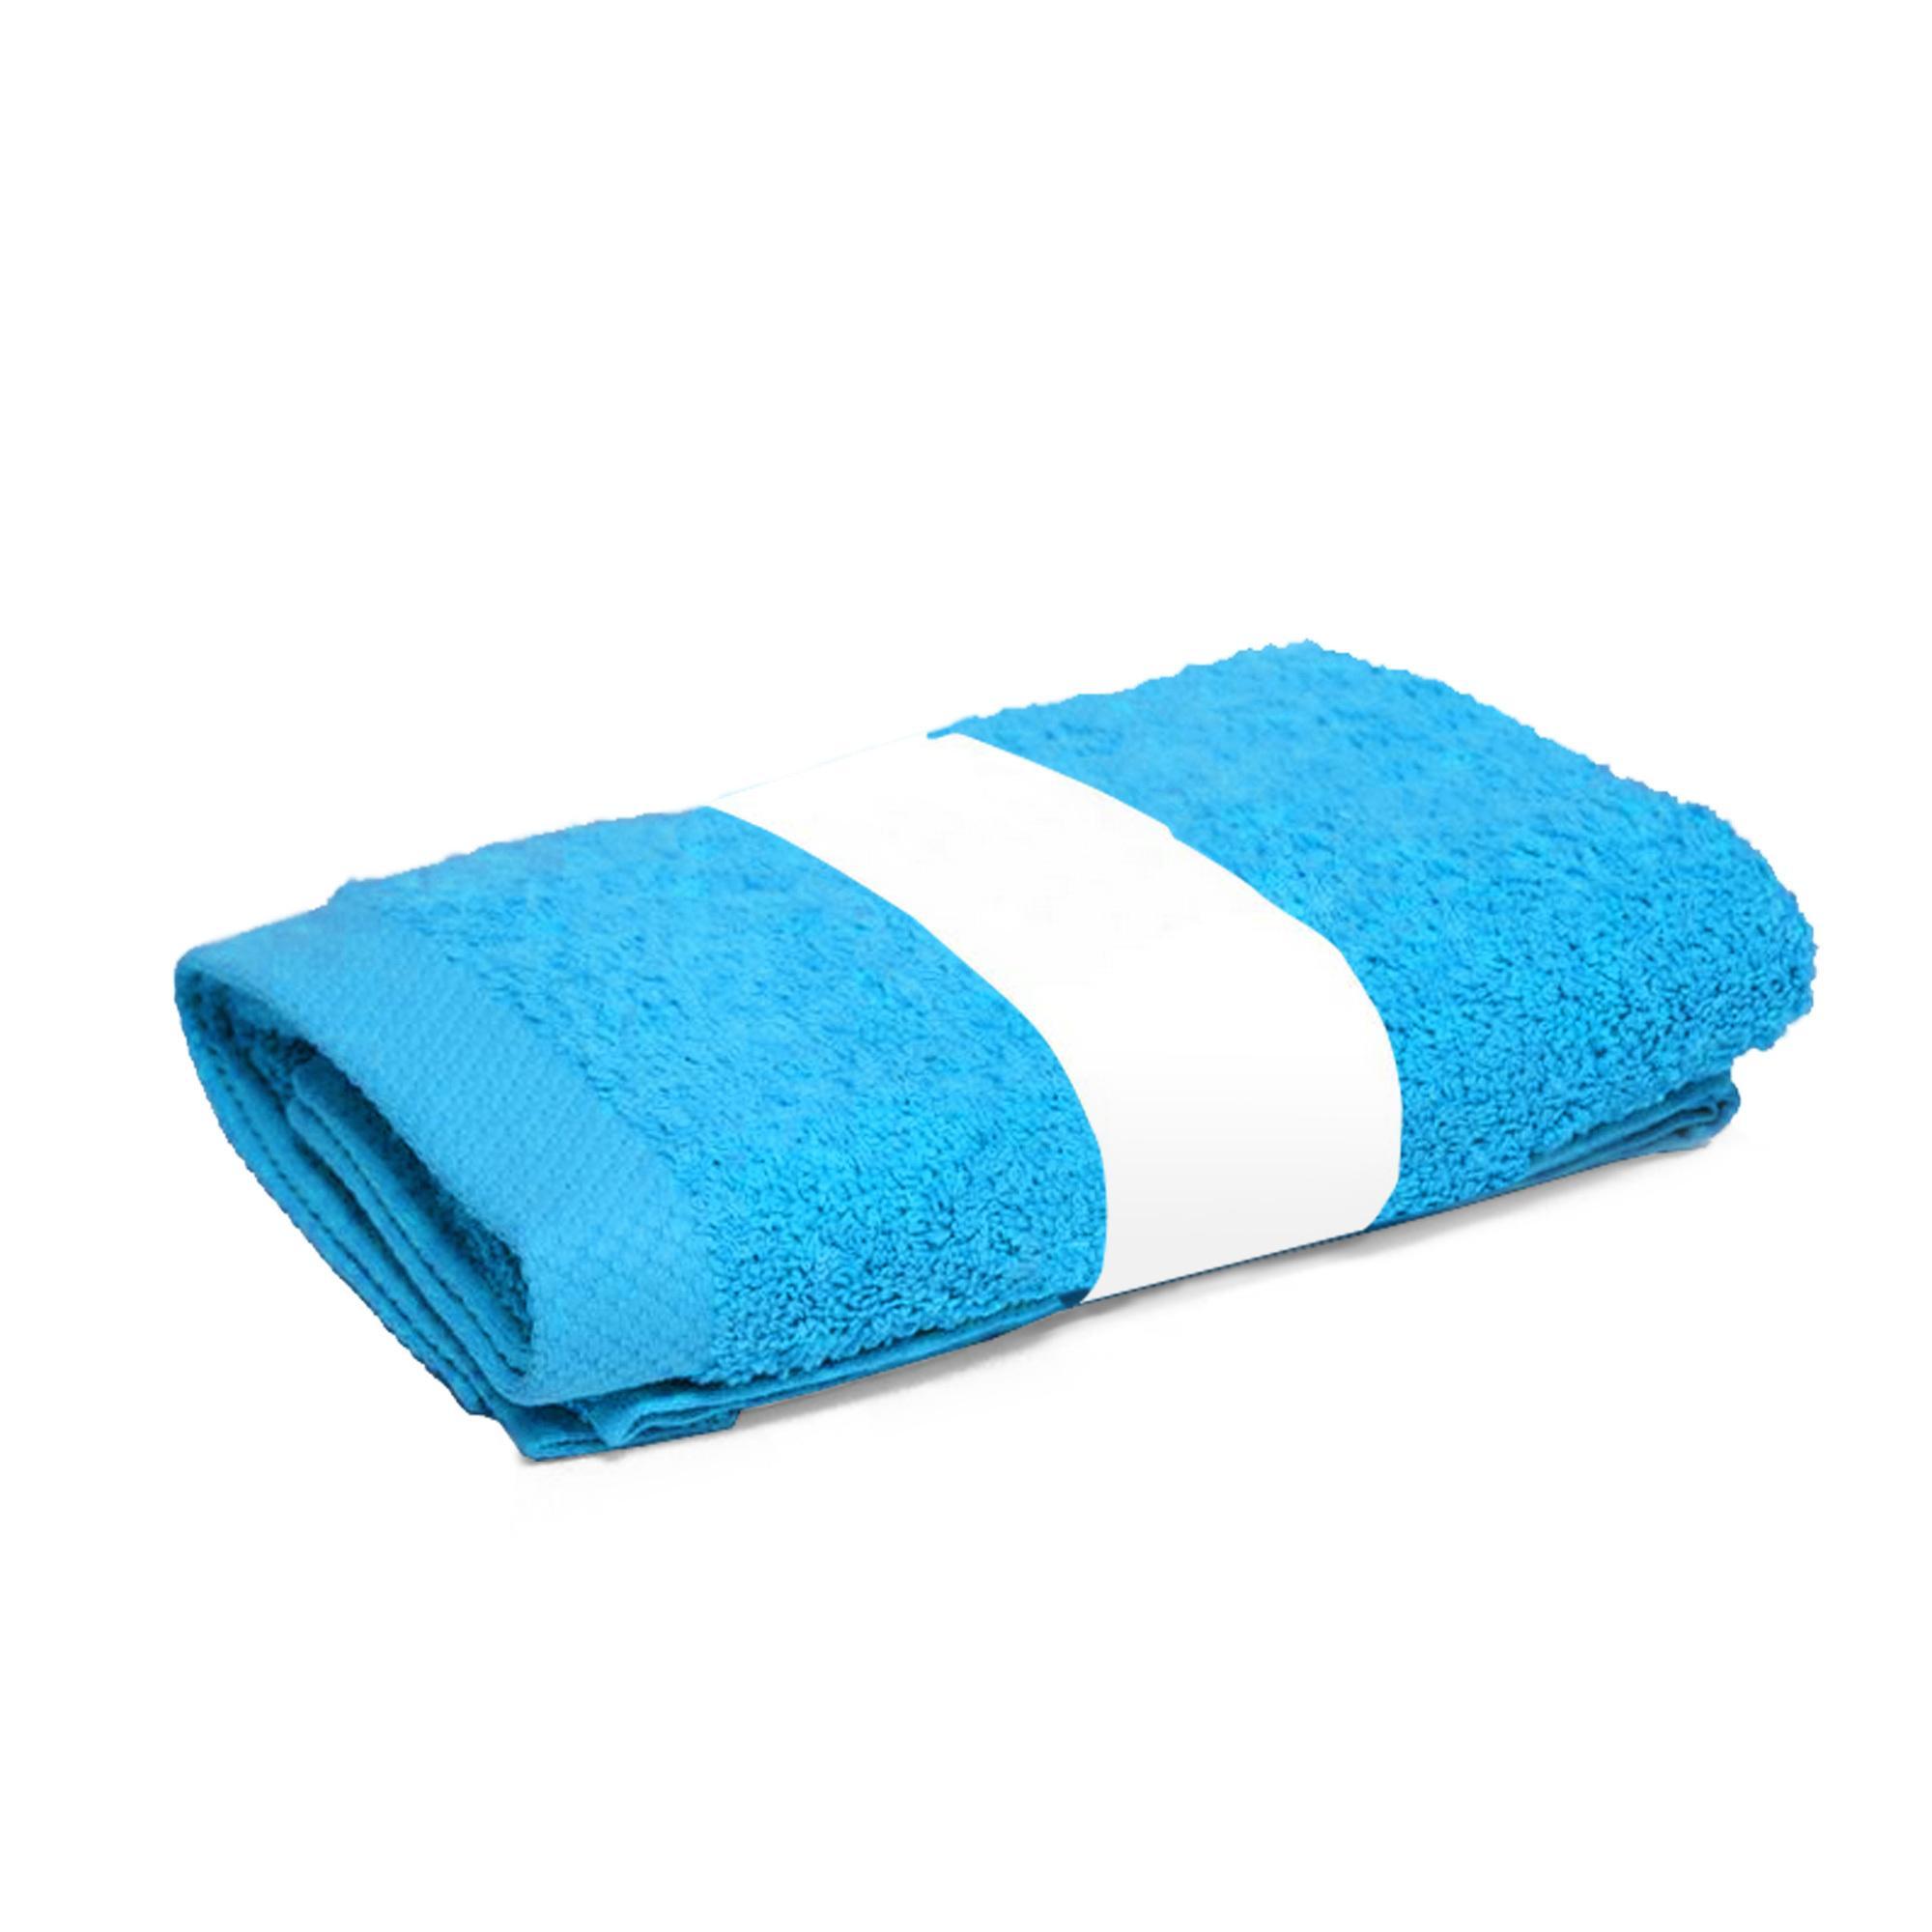 drap de douche 70x140cm coton uni pure bleu ocean linnea. Black Bedroom Furniture Sets. Home Design Ideas